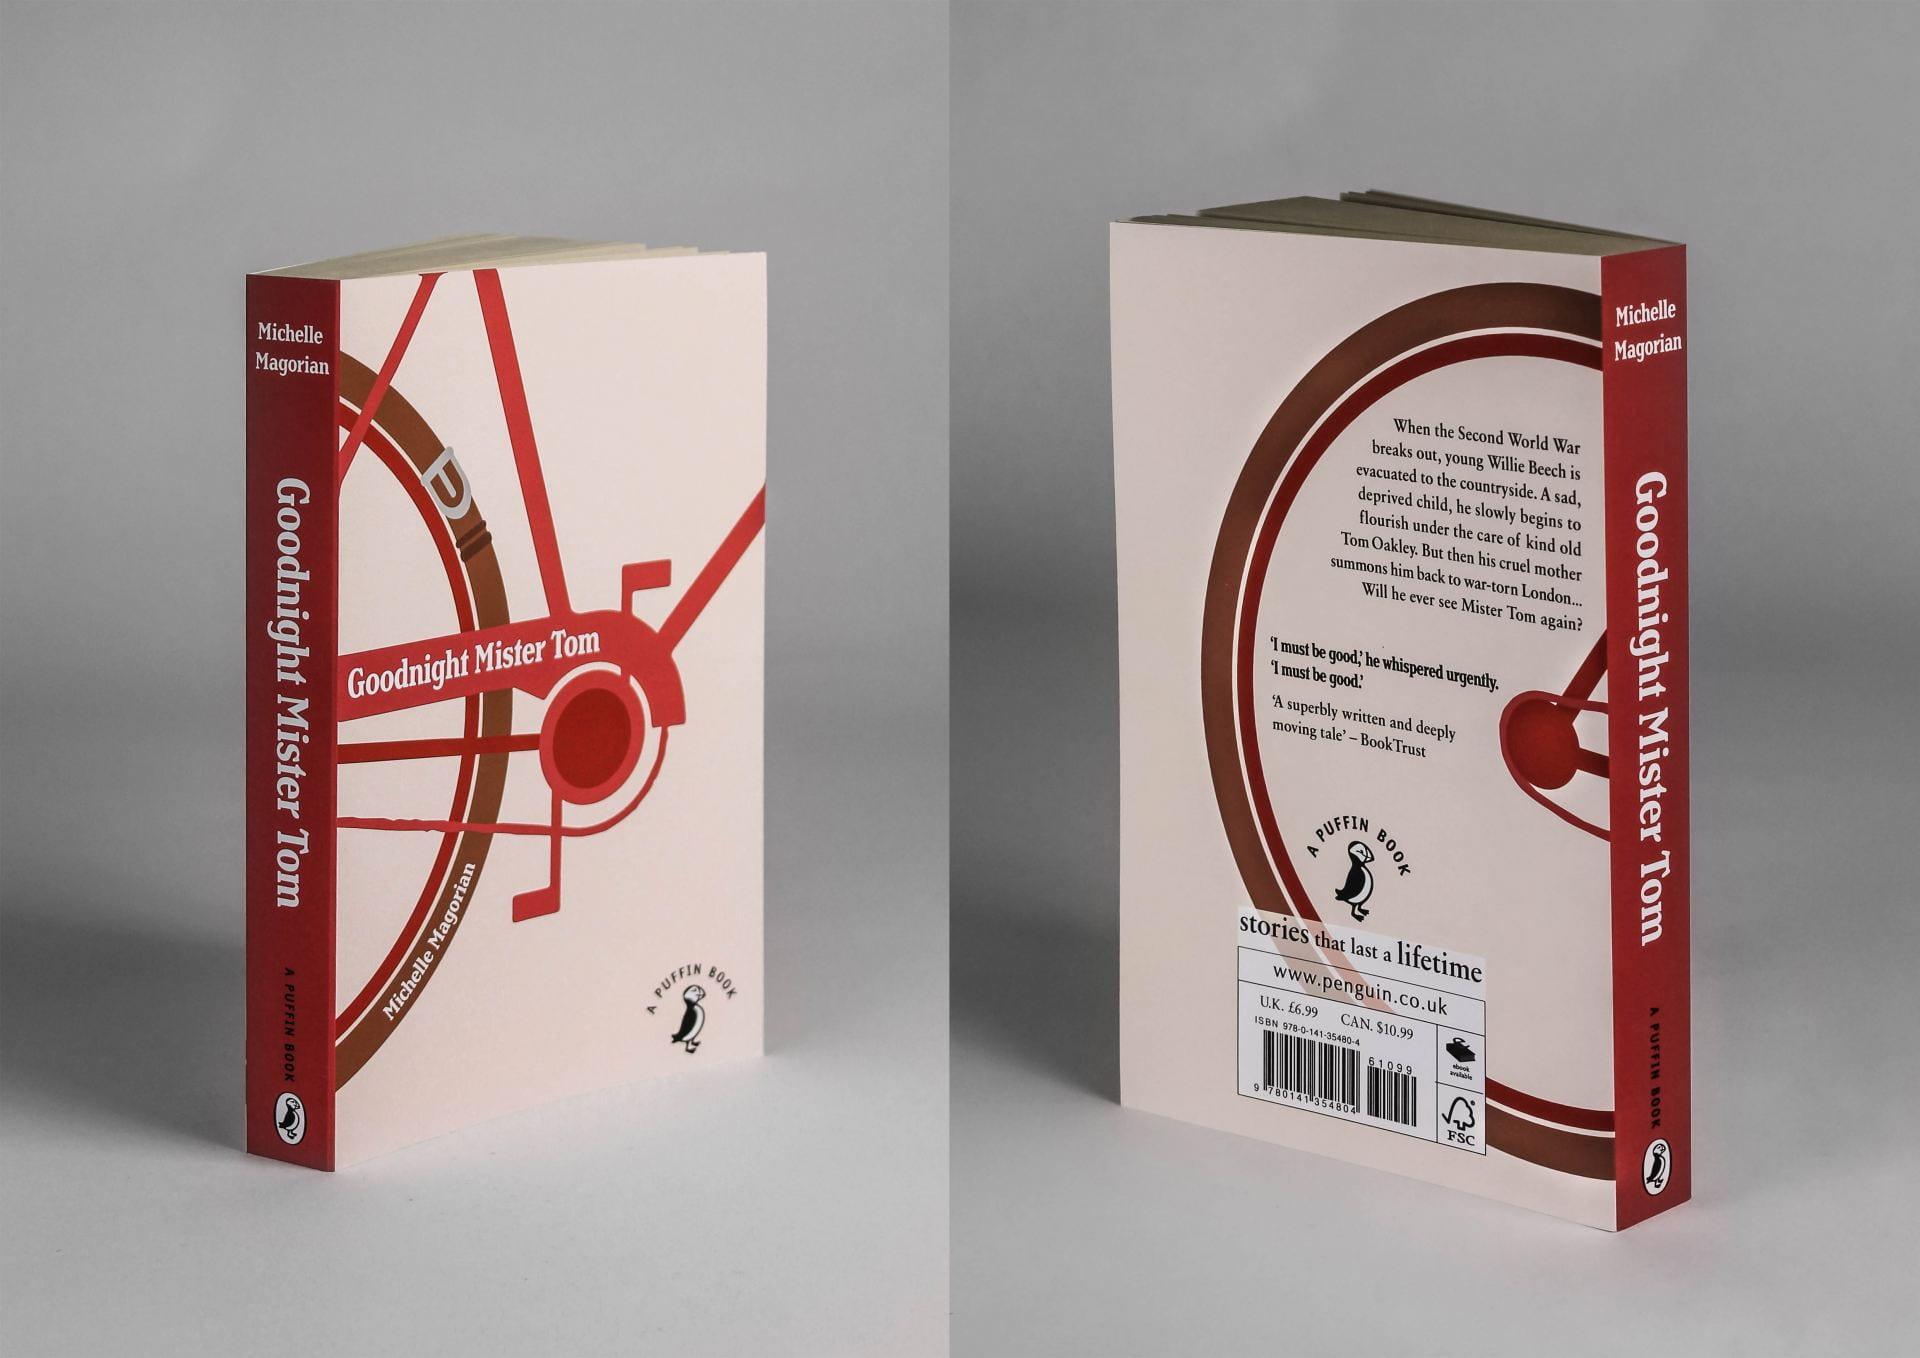 Penguin's Random House Award submission for